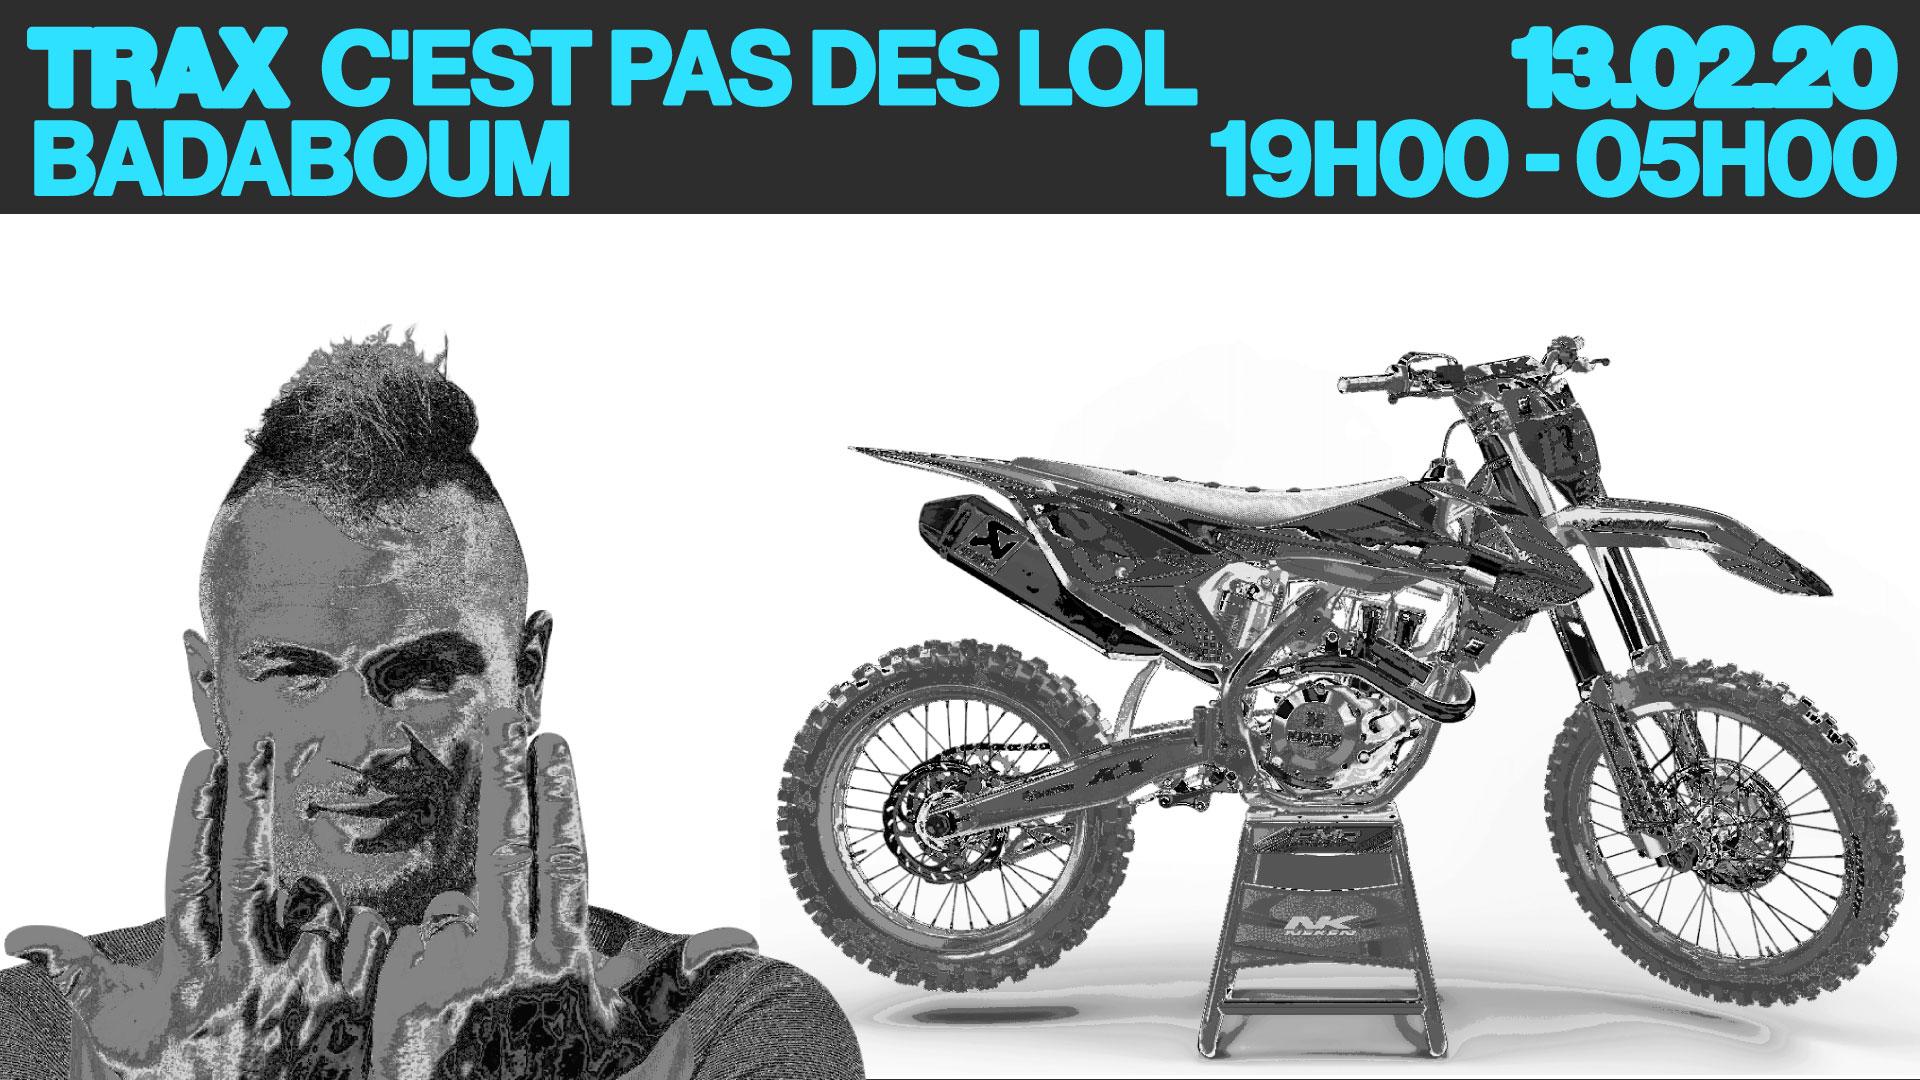 C'est pas lol by Trax w/ Andy 4000 & Trax dj family